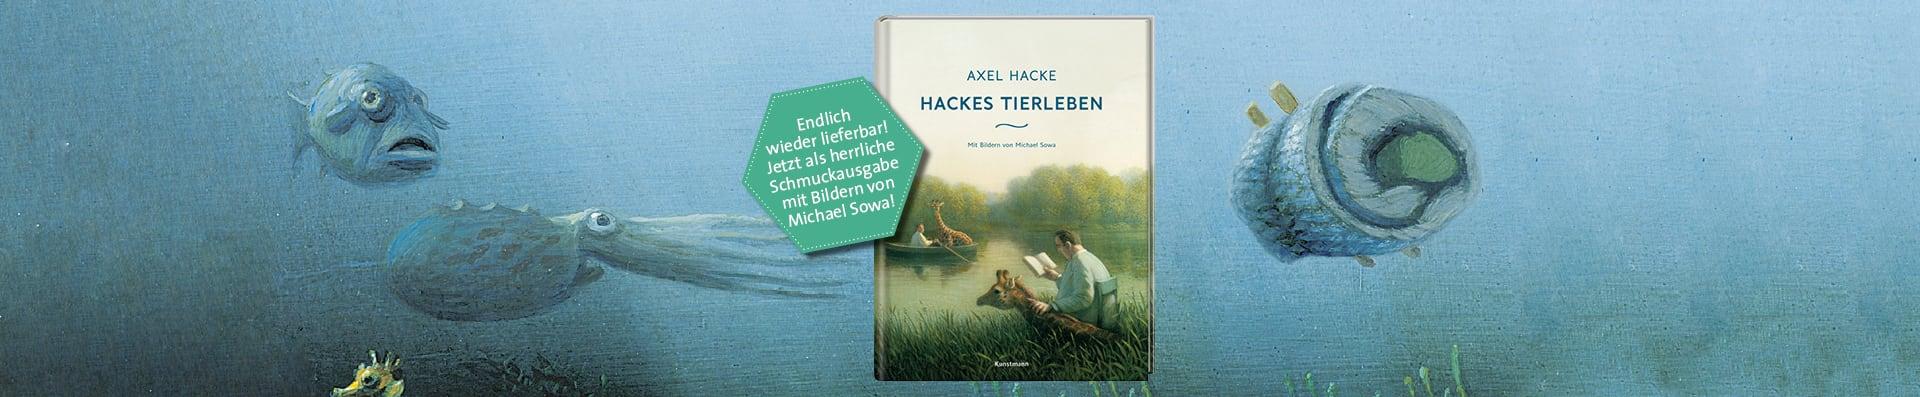 Axel Hacke – Hackes Tierleben